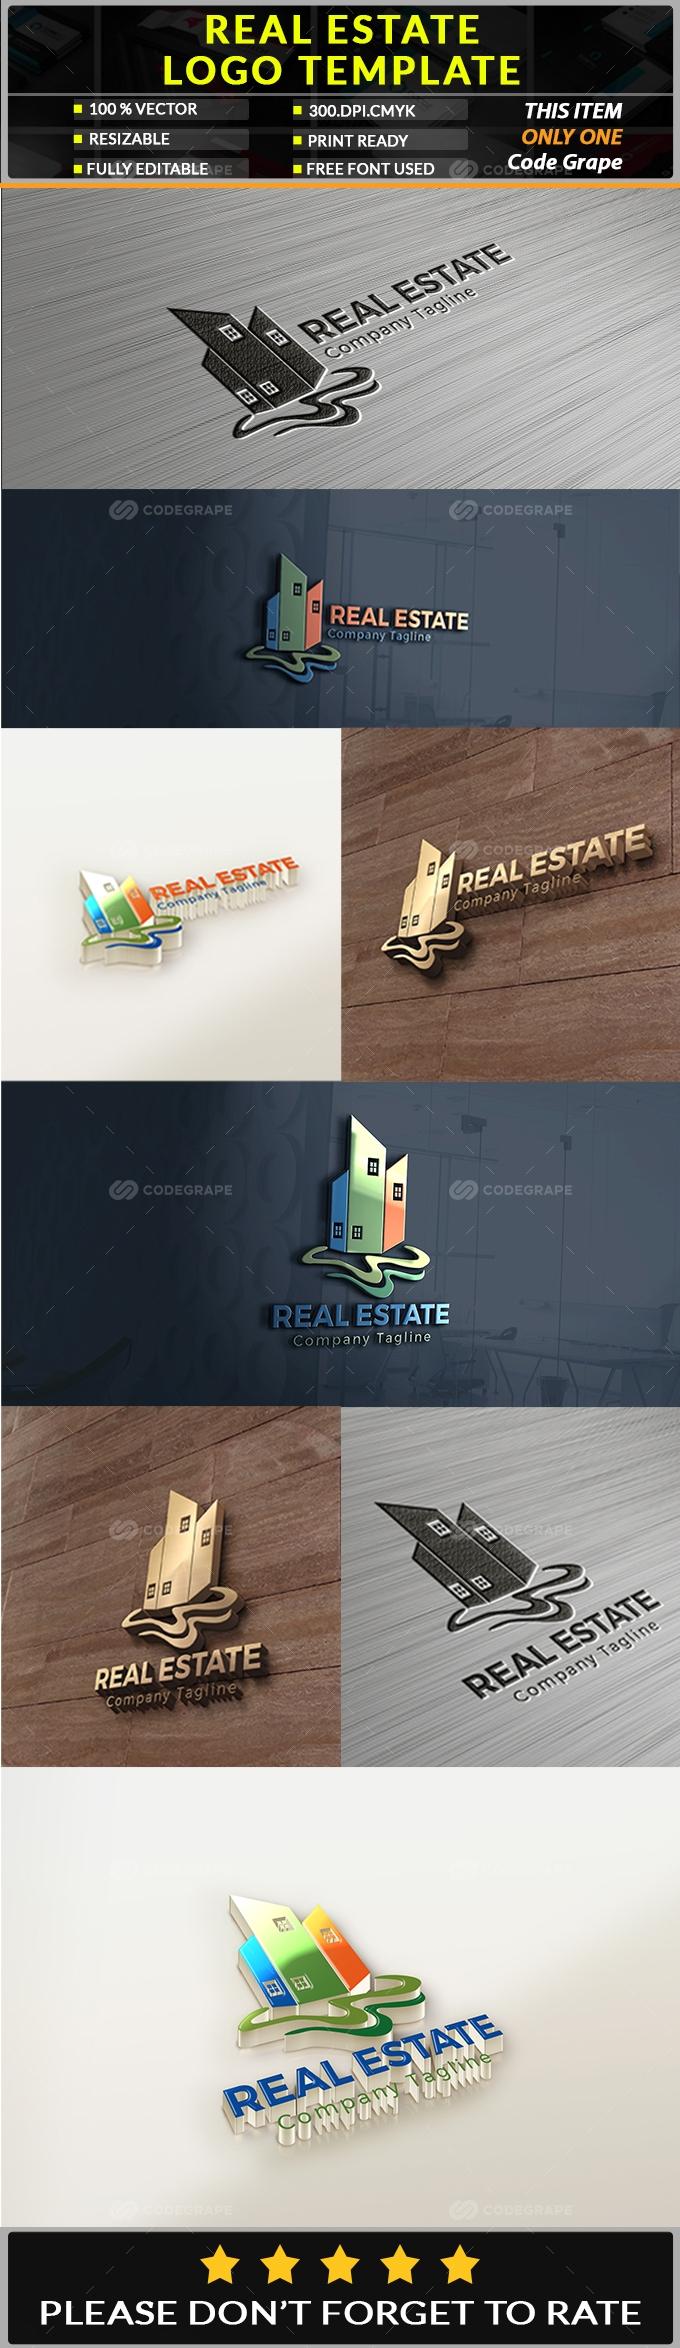 Real Estate Logo Templete